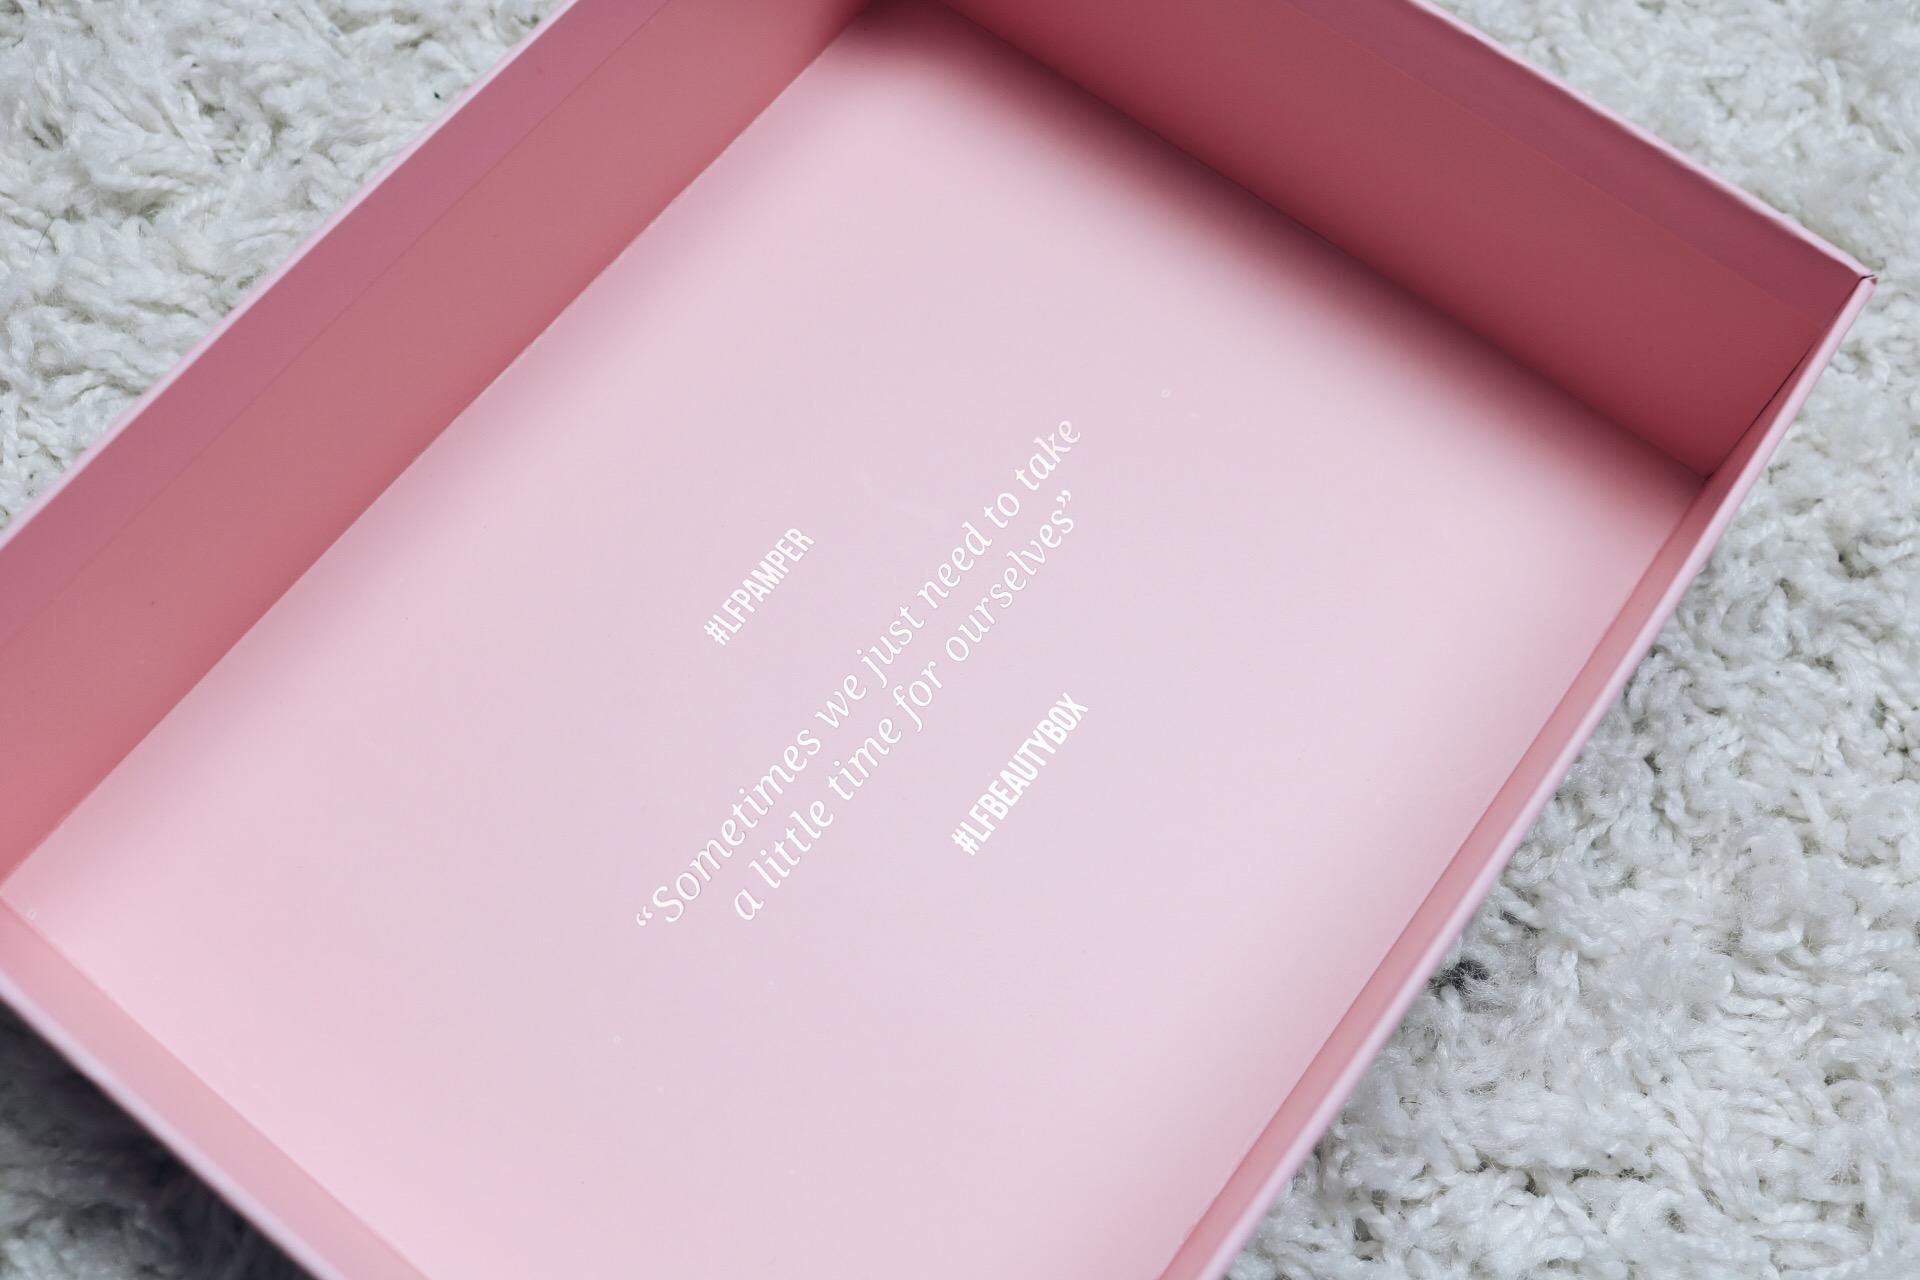 Lookfantastic lfpamper beauty box amandhans lookfantastic glossybox skönhetsblogg skönhetsbloggare landskrona skåne skönhet tips beautybox prenumerationsbox hittabox